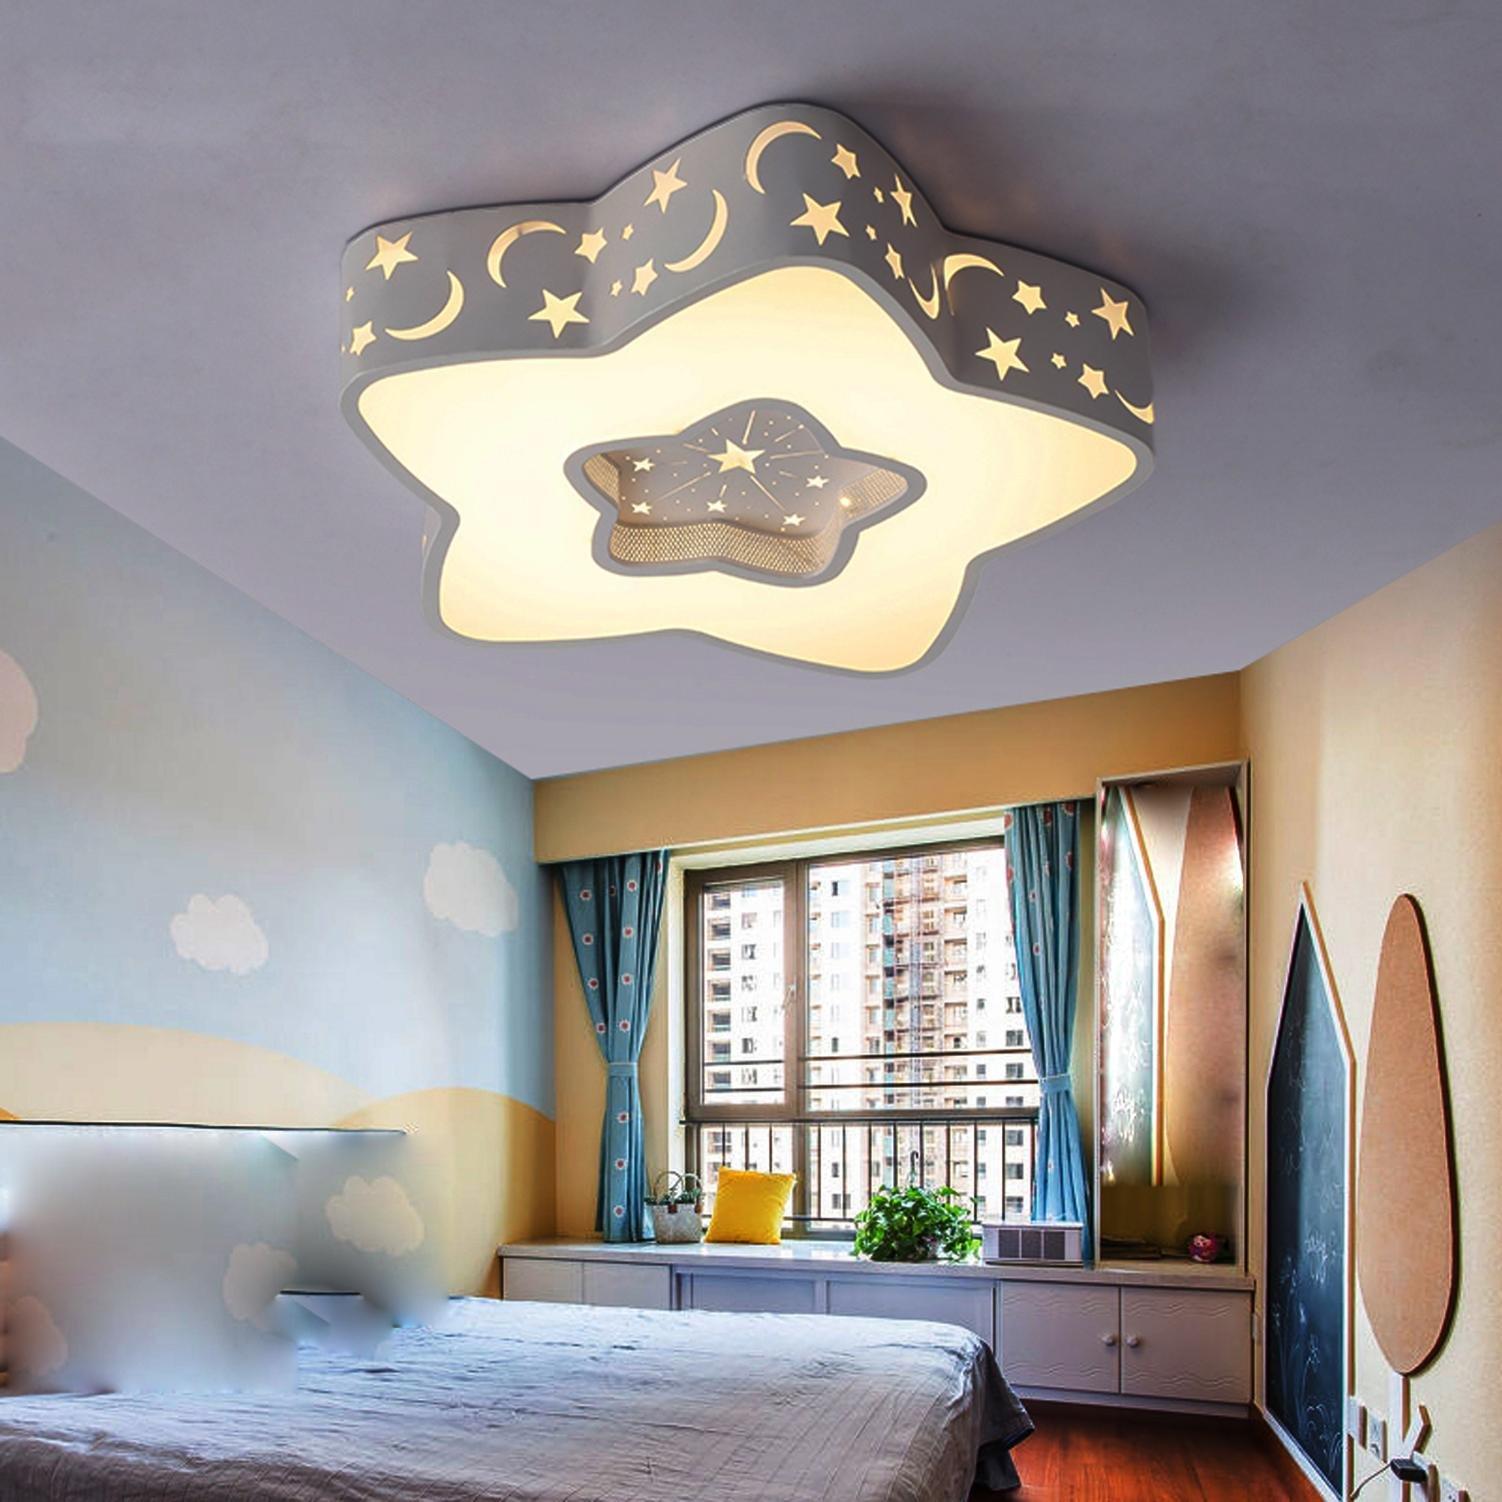 Maniny Children room ceiling lamp girl bedroom princess star room warm cartoon boy creative pentagram lamp care eye Lighting